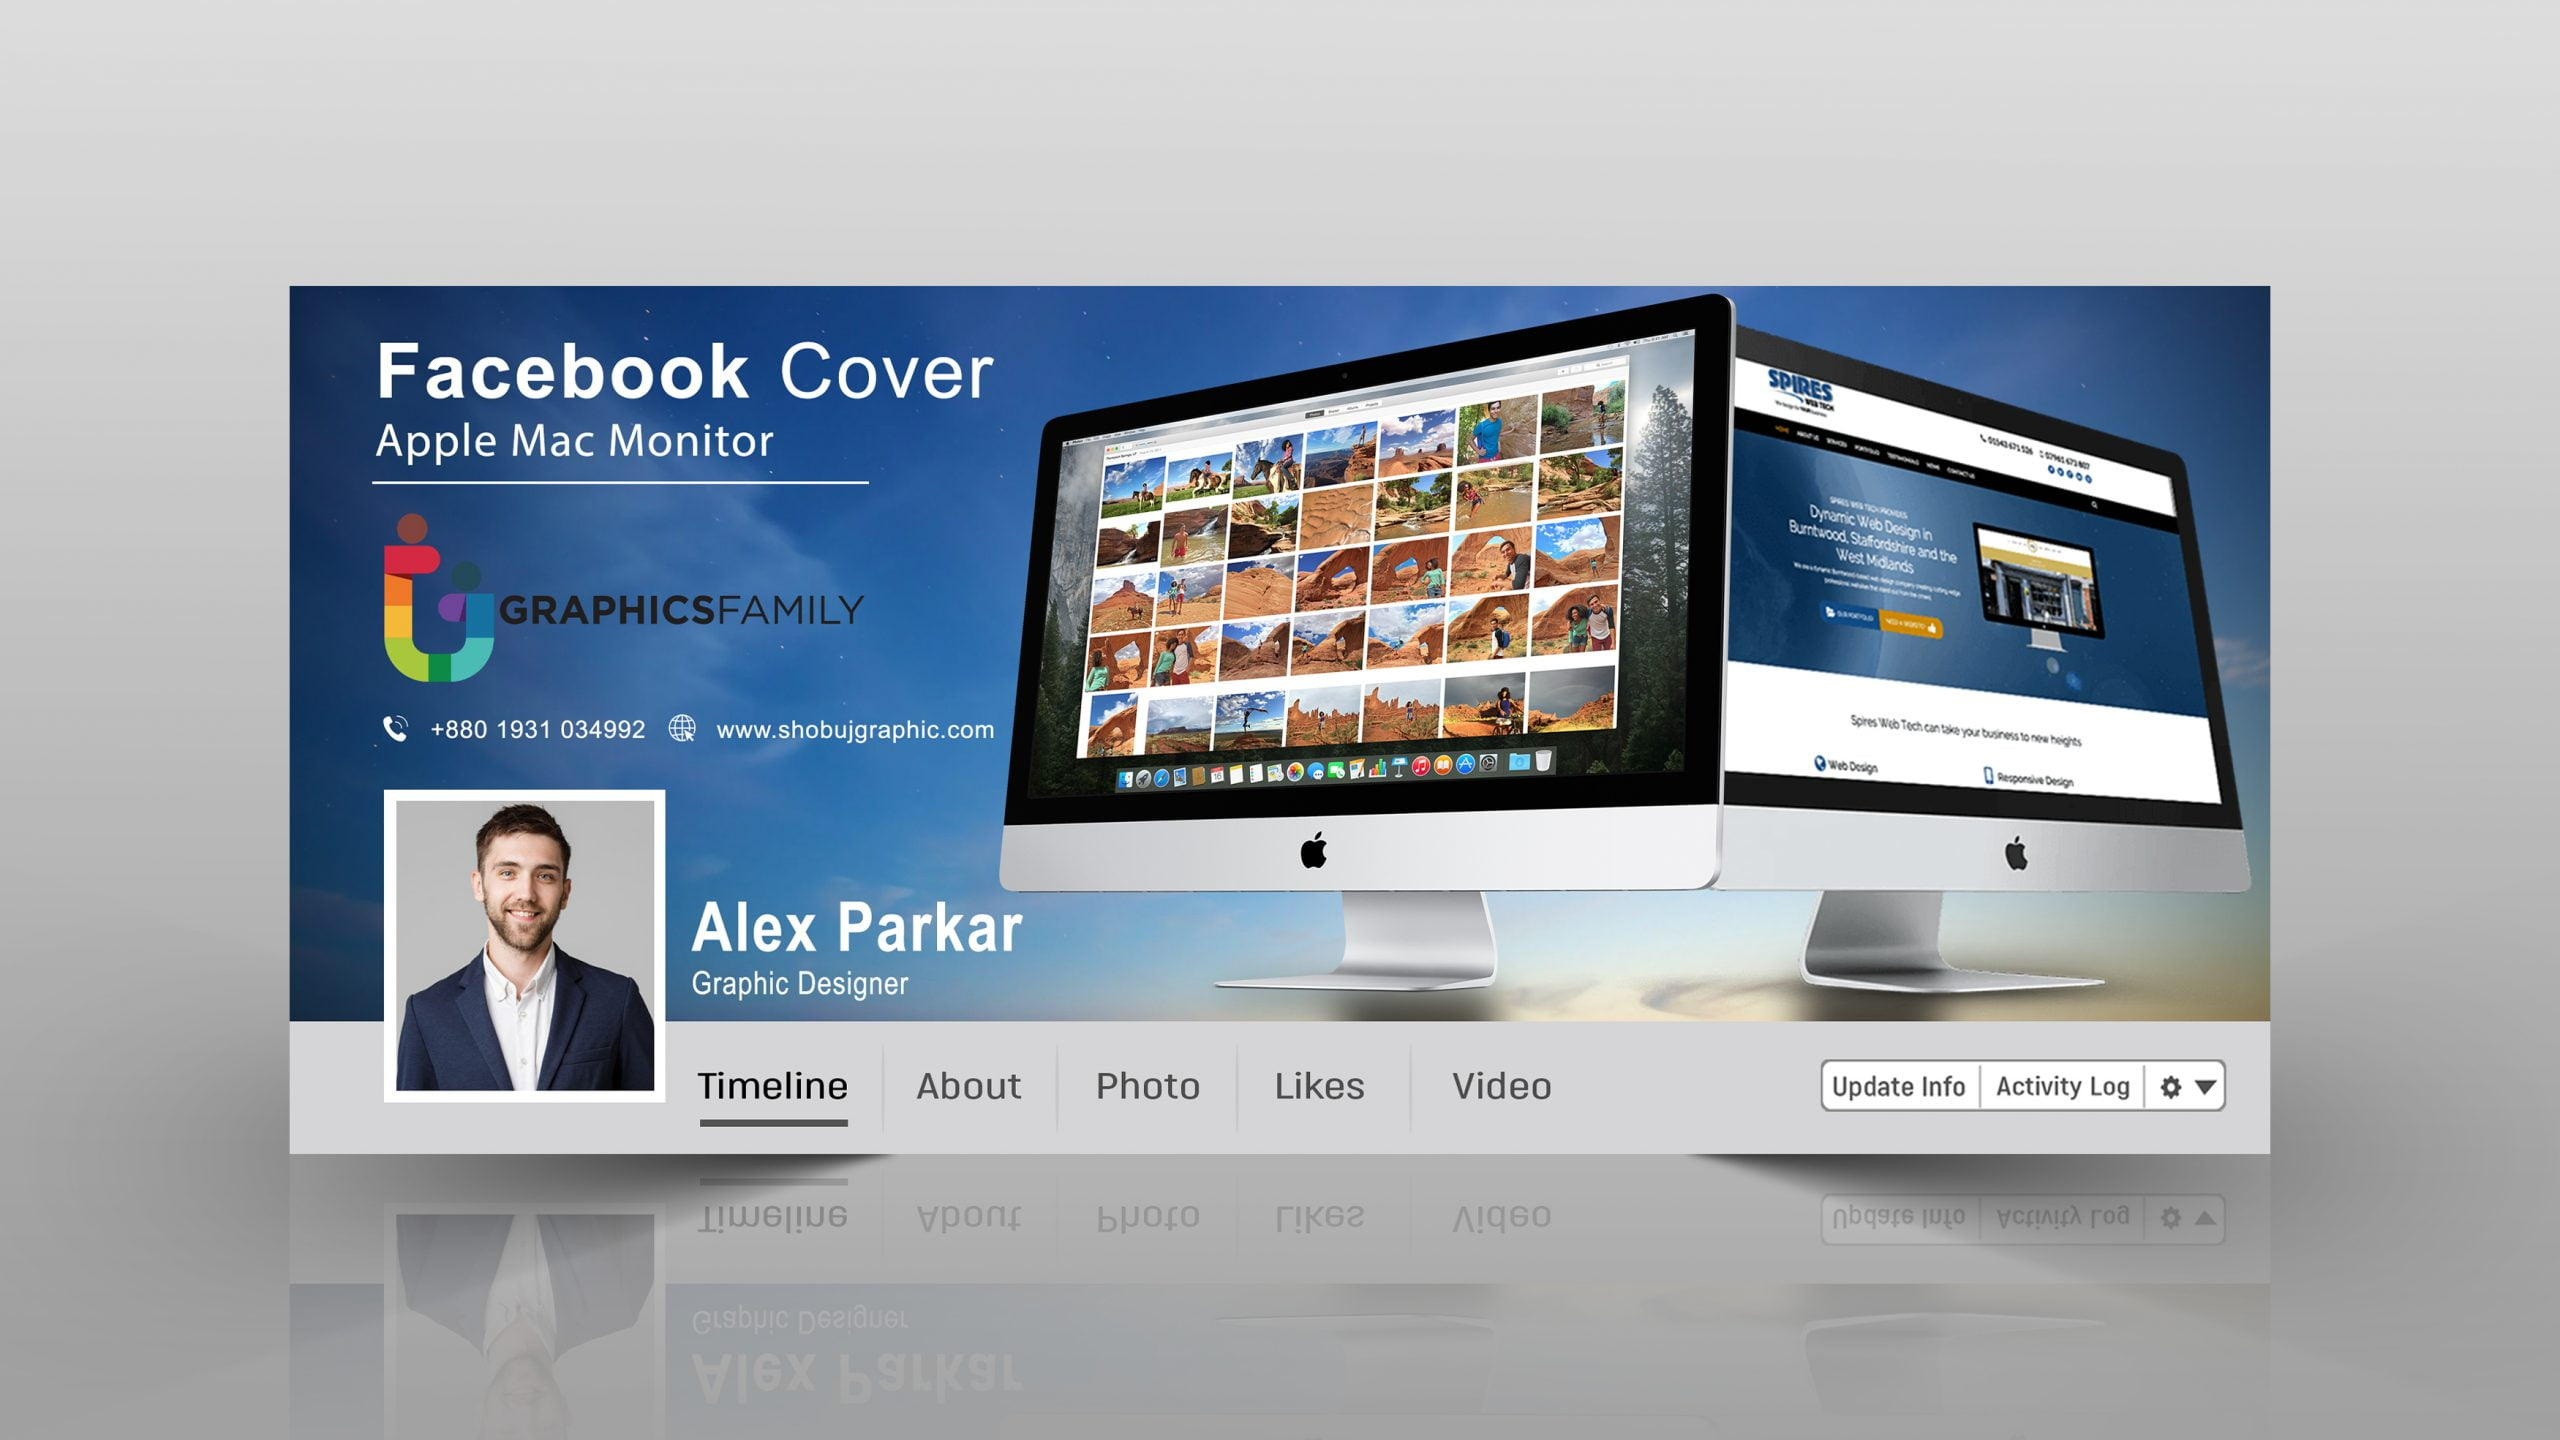 Web Marketing Digital Studio Facebook Cover Template